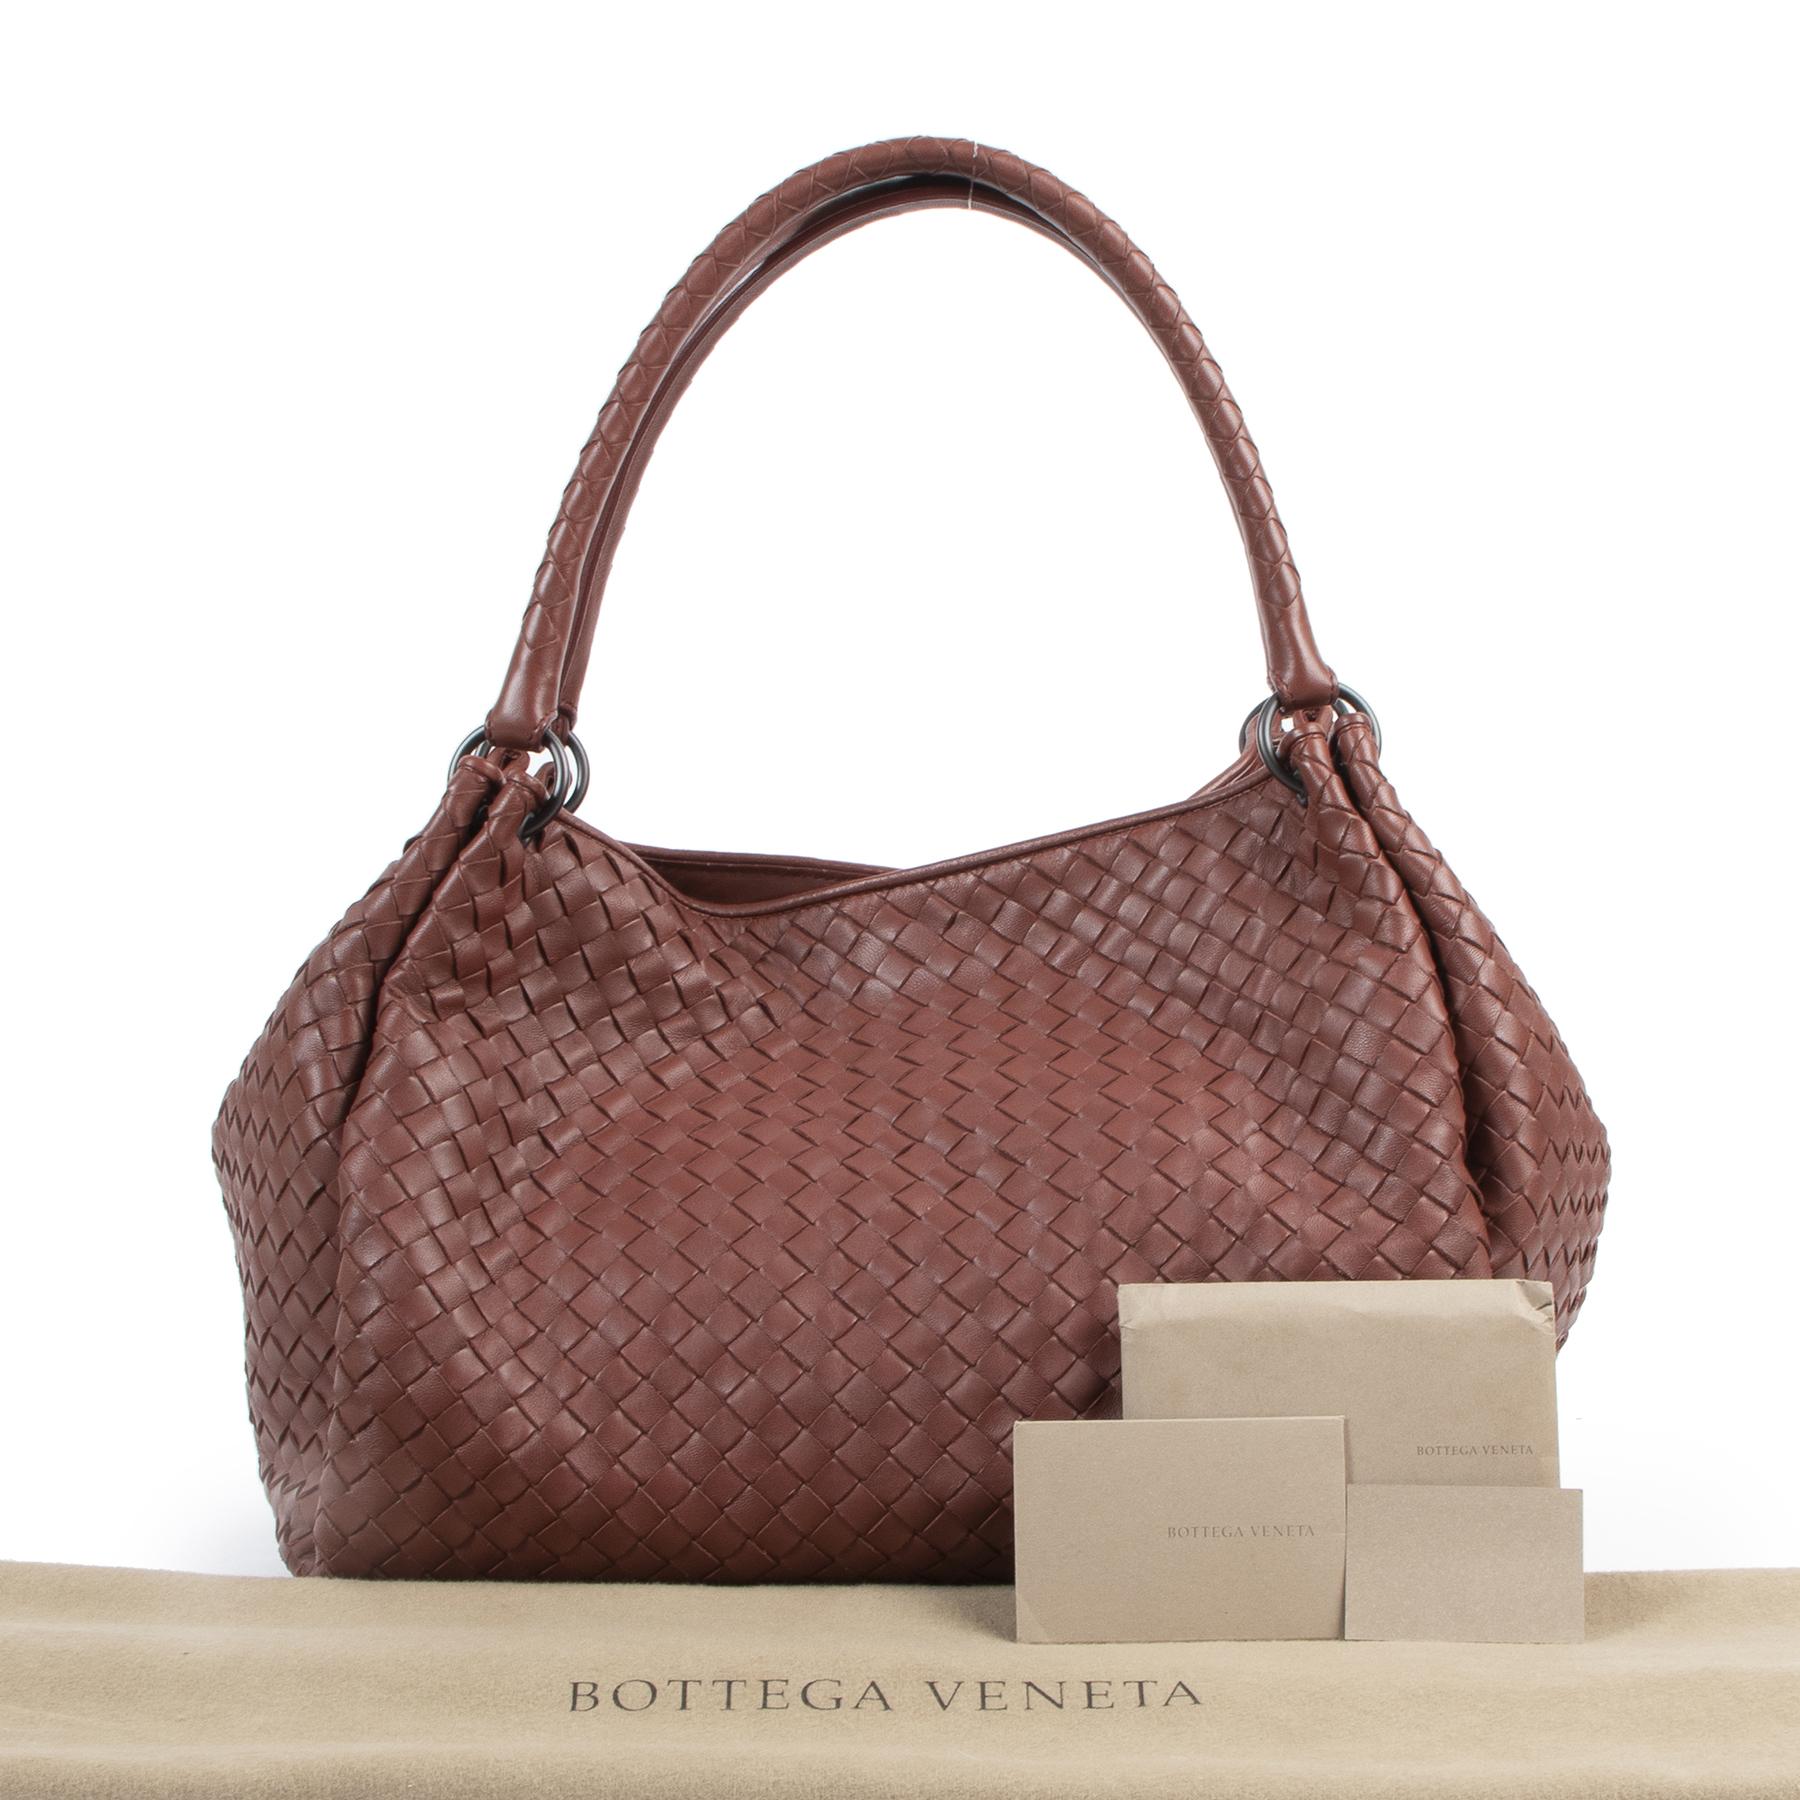 Bottega Veneta Rust Intrecciato Leather Shopper for sale online at Labellov secondhand luxury